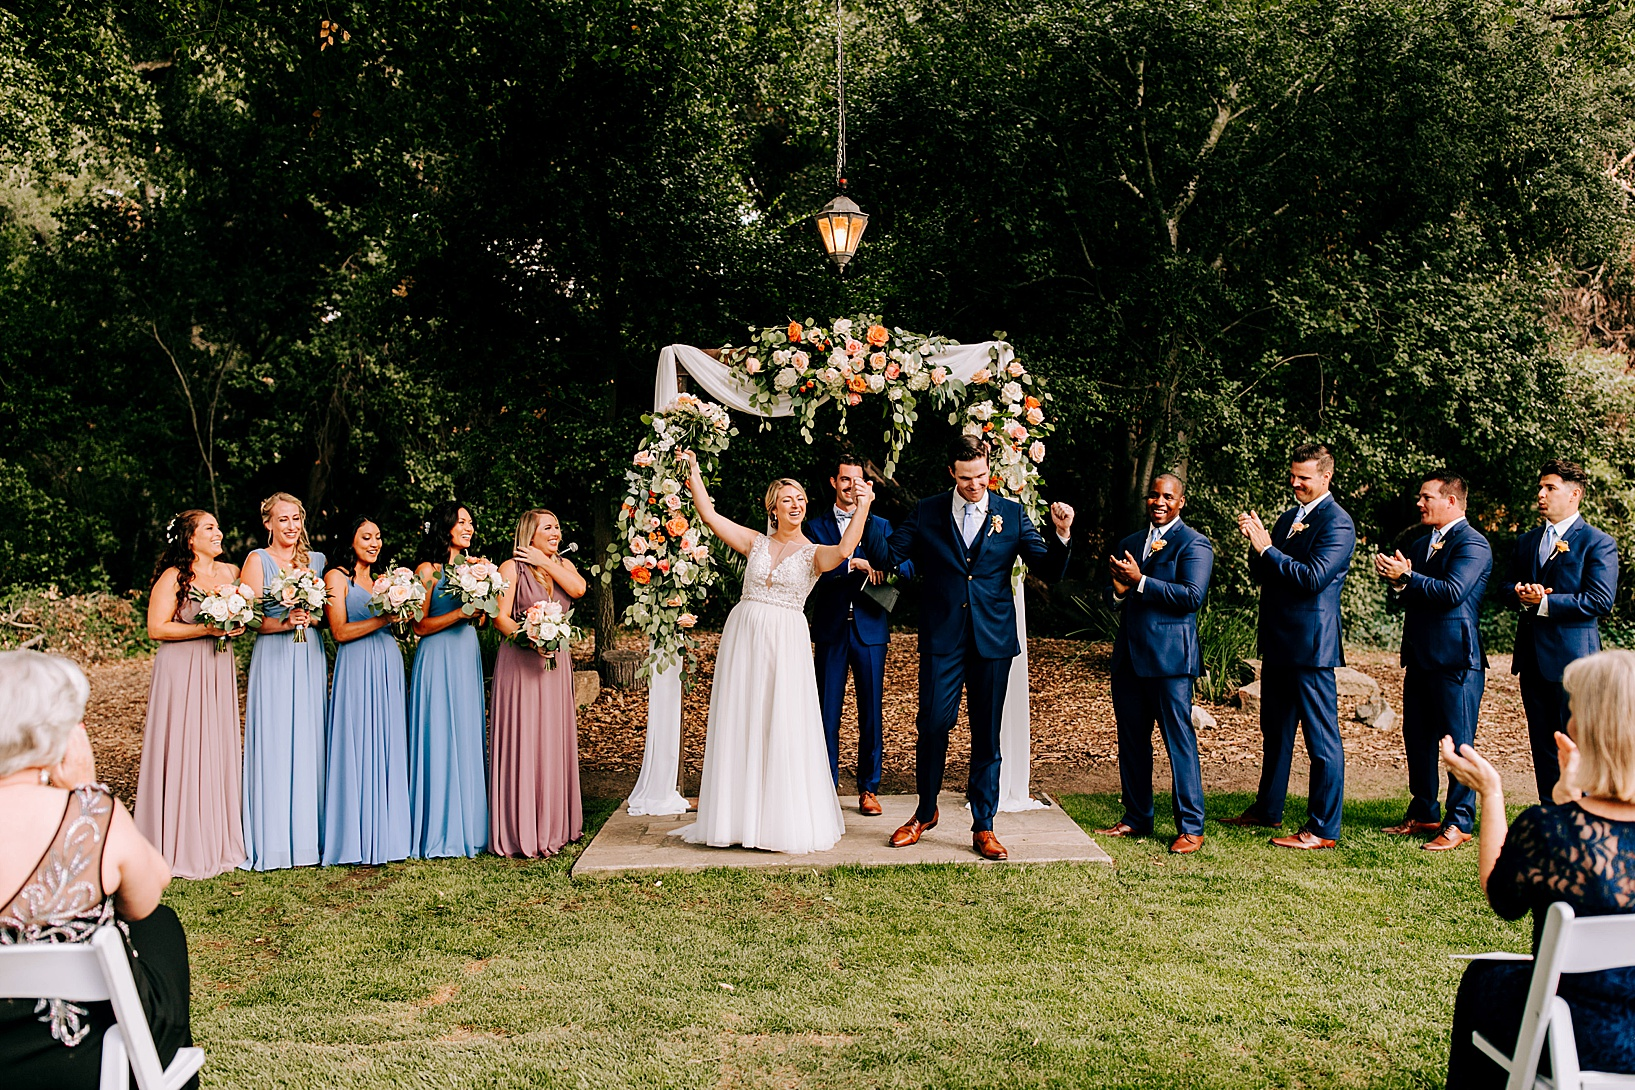 Ceremony for Temecula wedding at Temecula Creek Inn